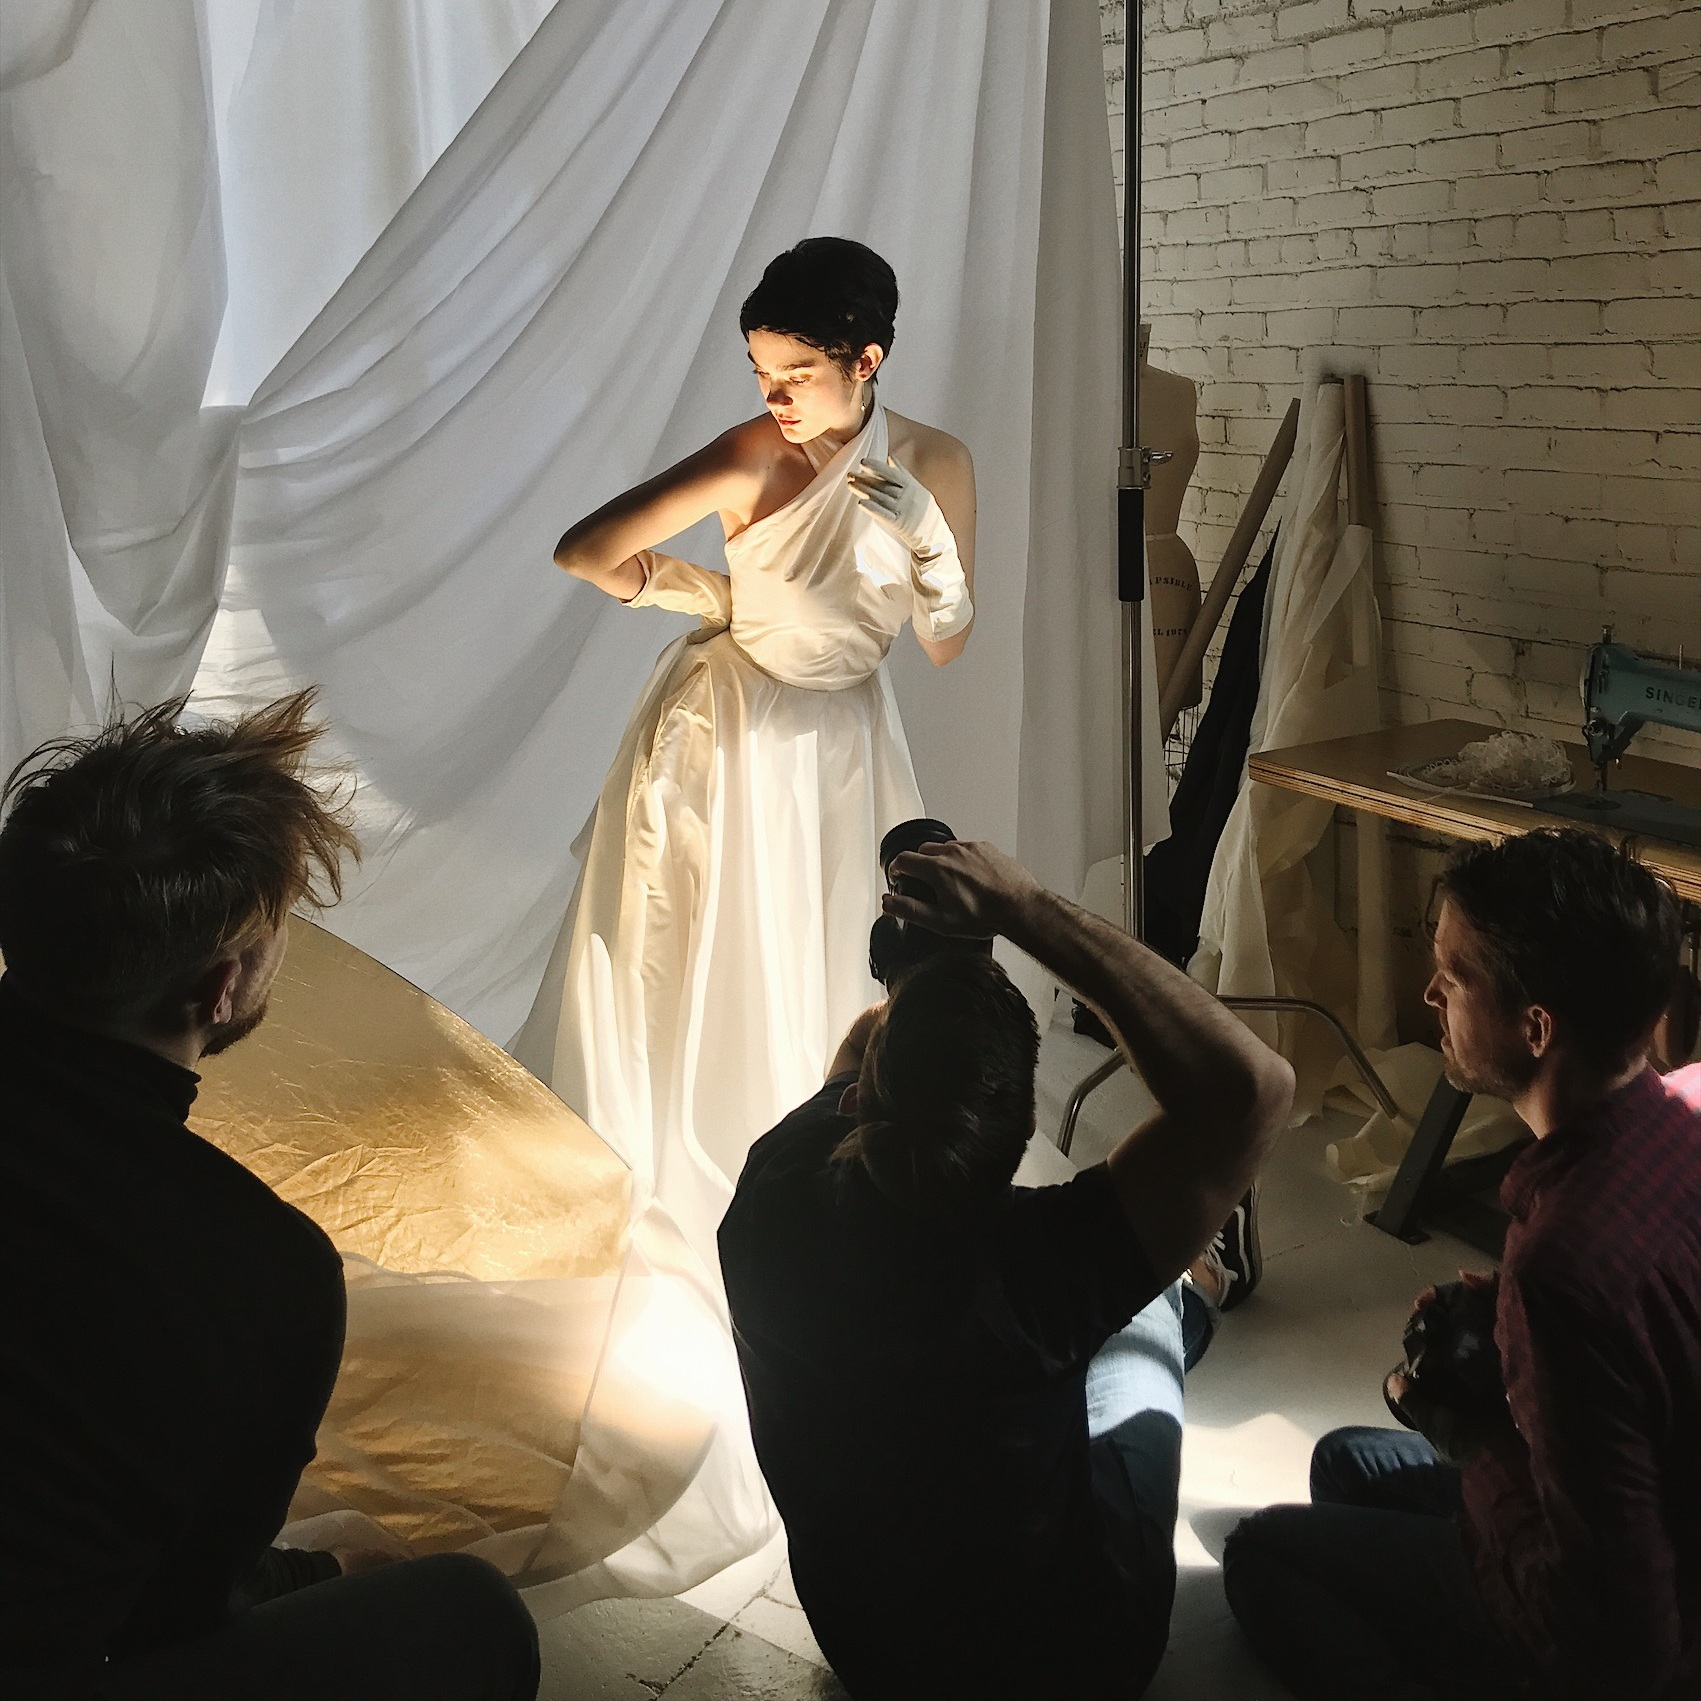 beth cath styling art direction photo shoot photoshoot minneapolis fashion magazine fine art high fashion direction creative director target style